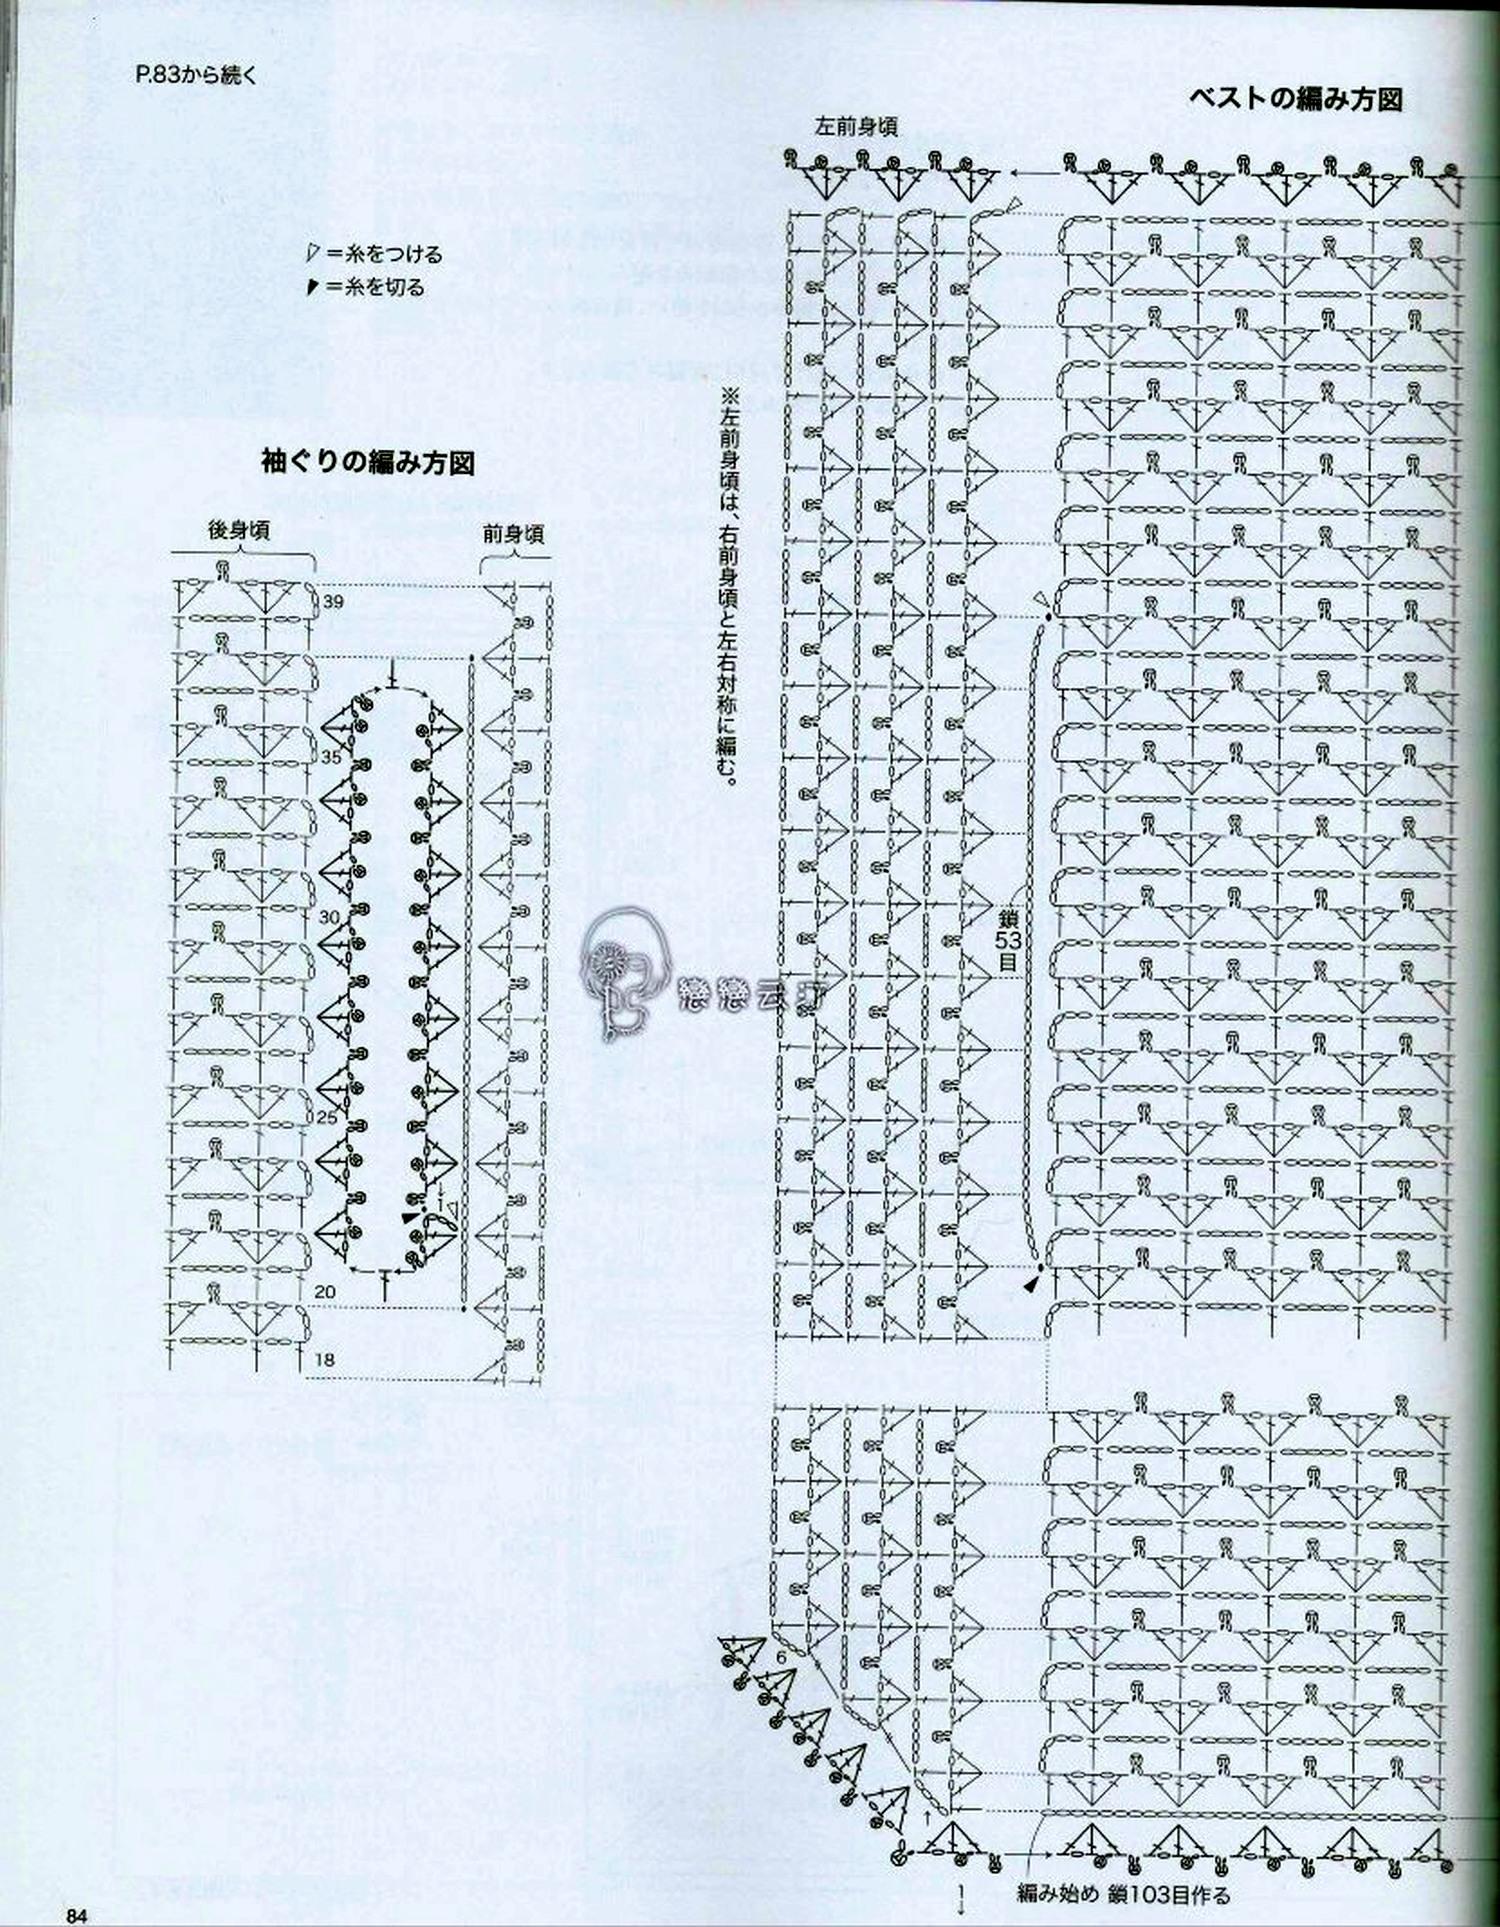 0991_4160vzLBs16 (24)